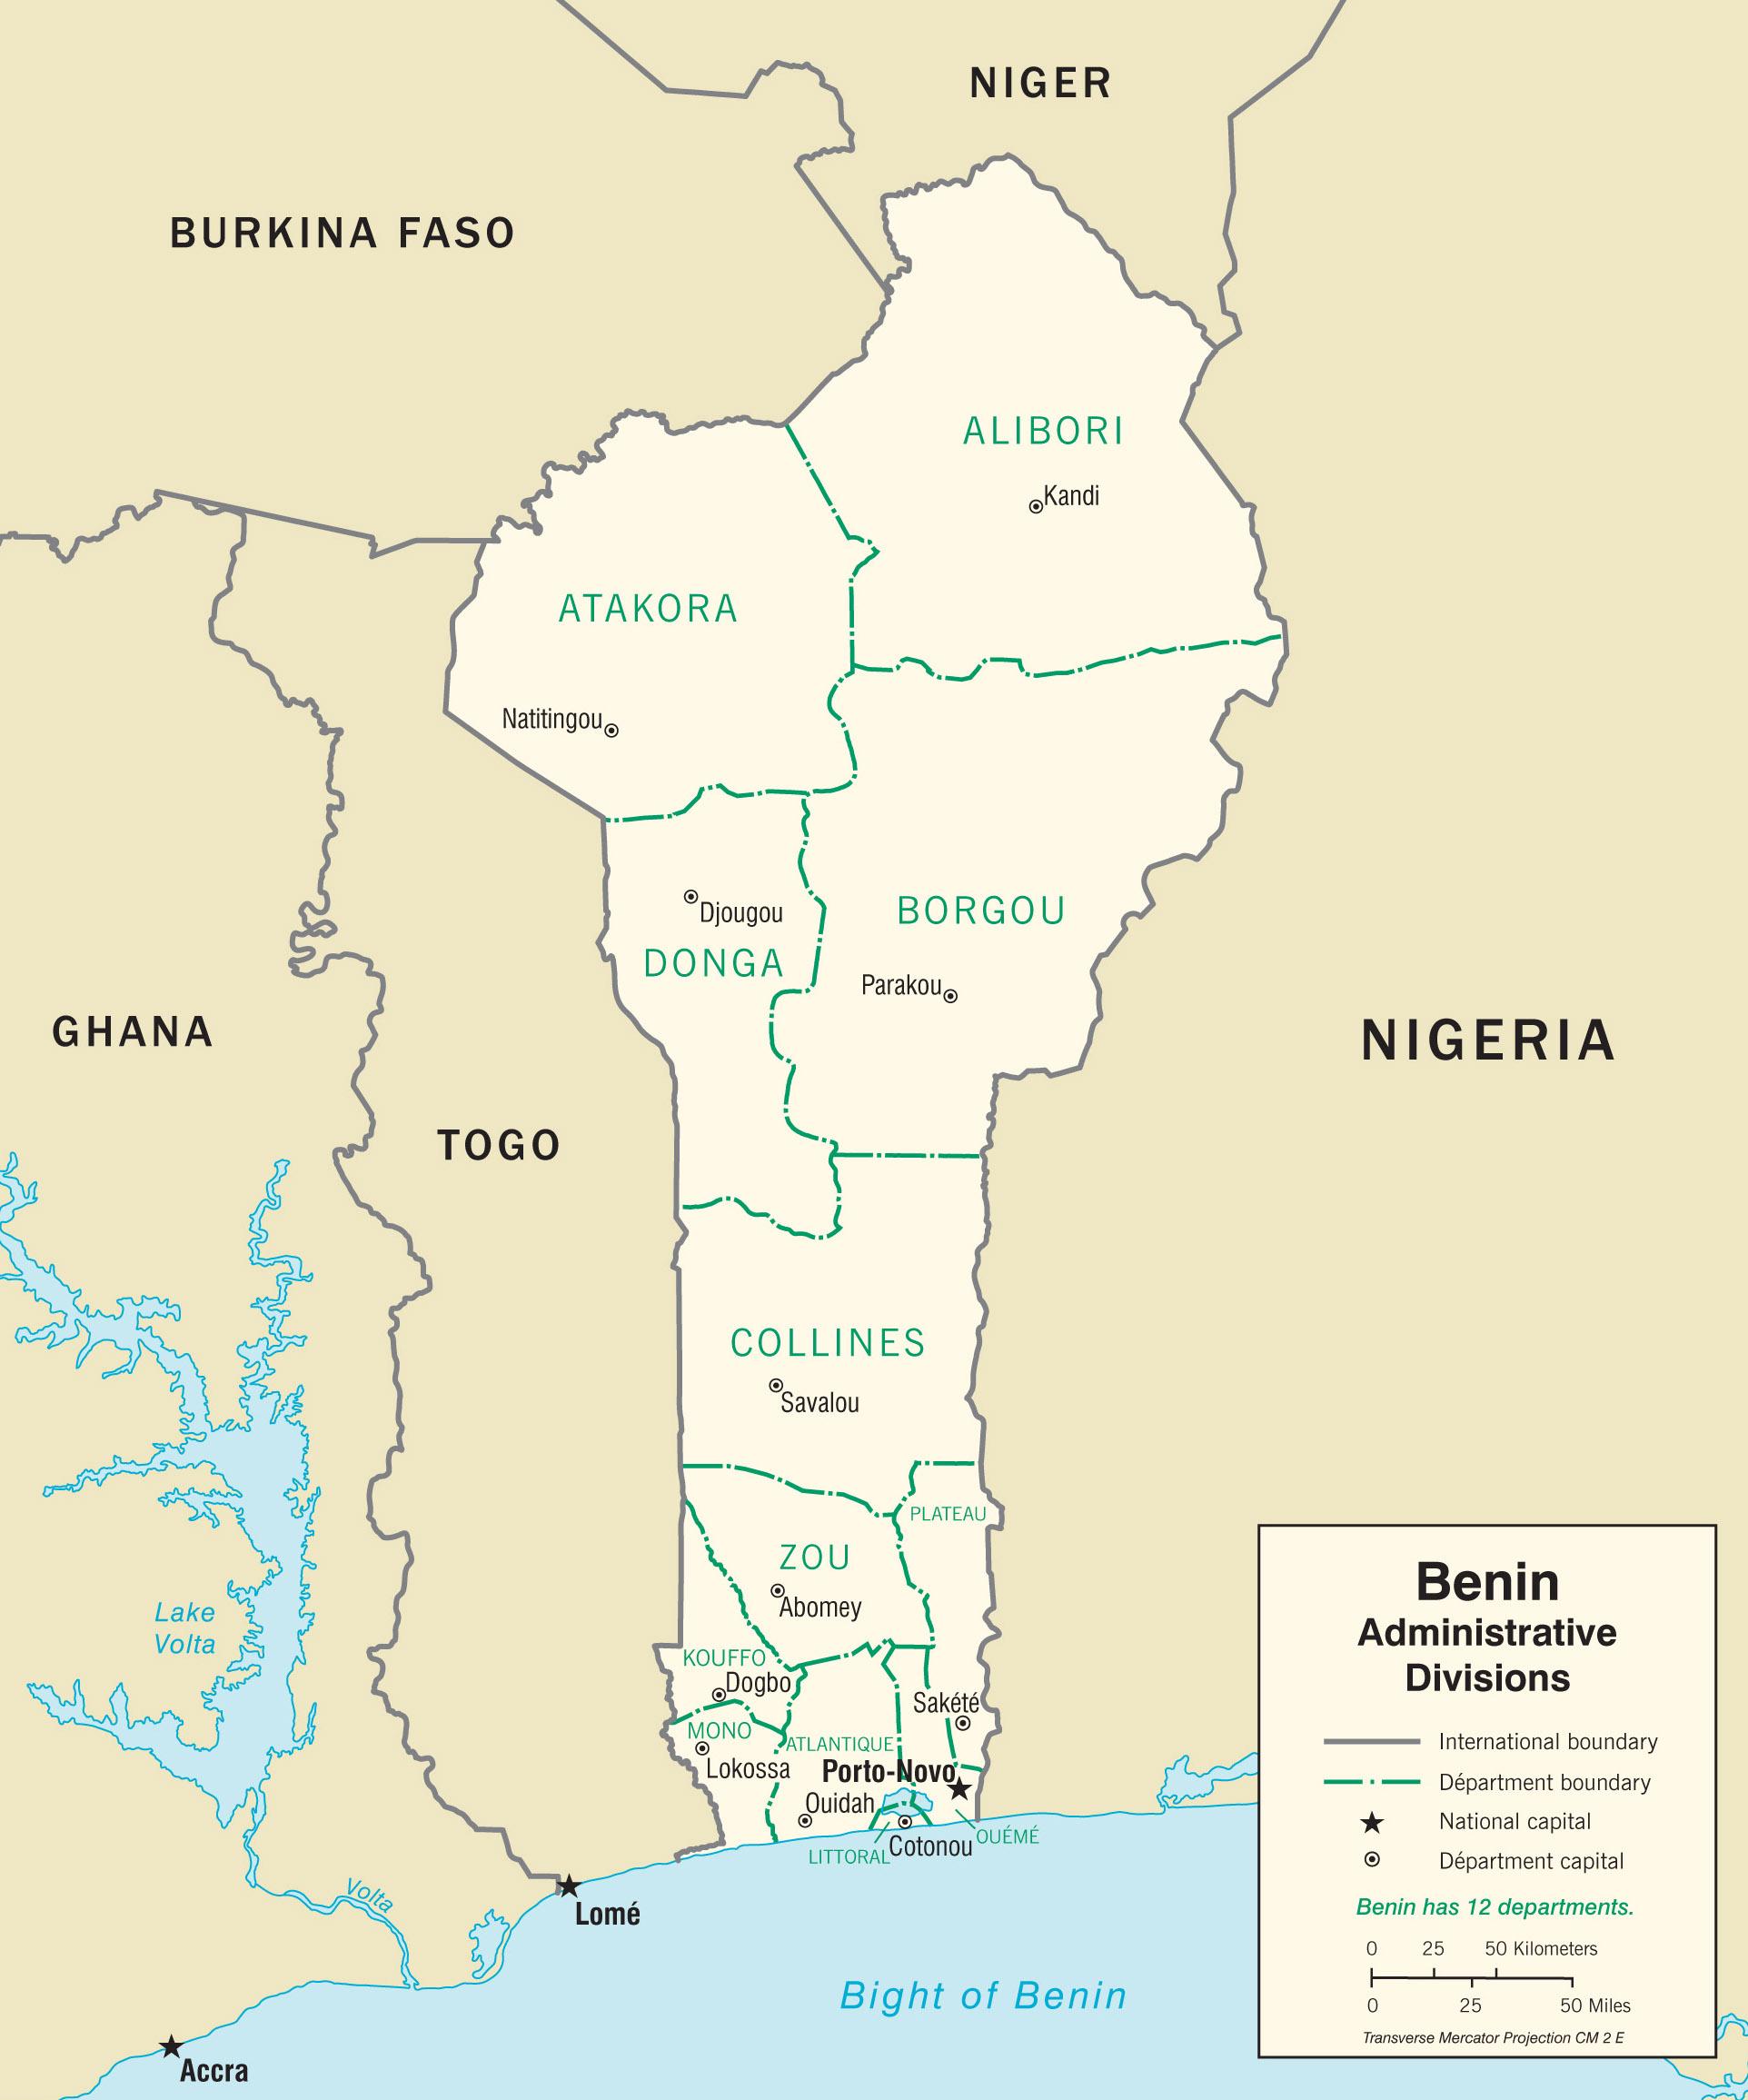 Relativ Cartes du Benin - Carte-monde.org WC19